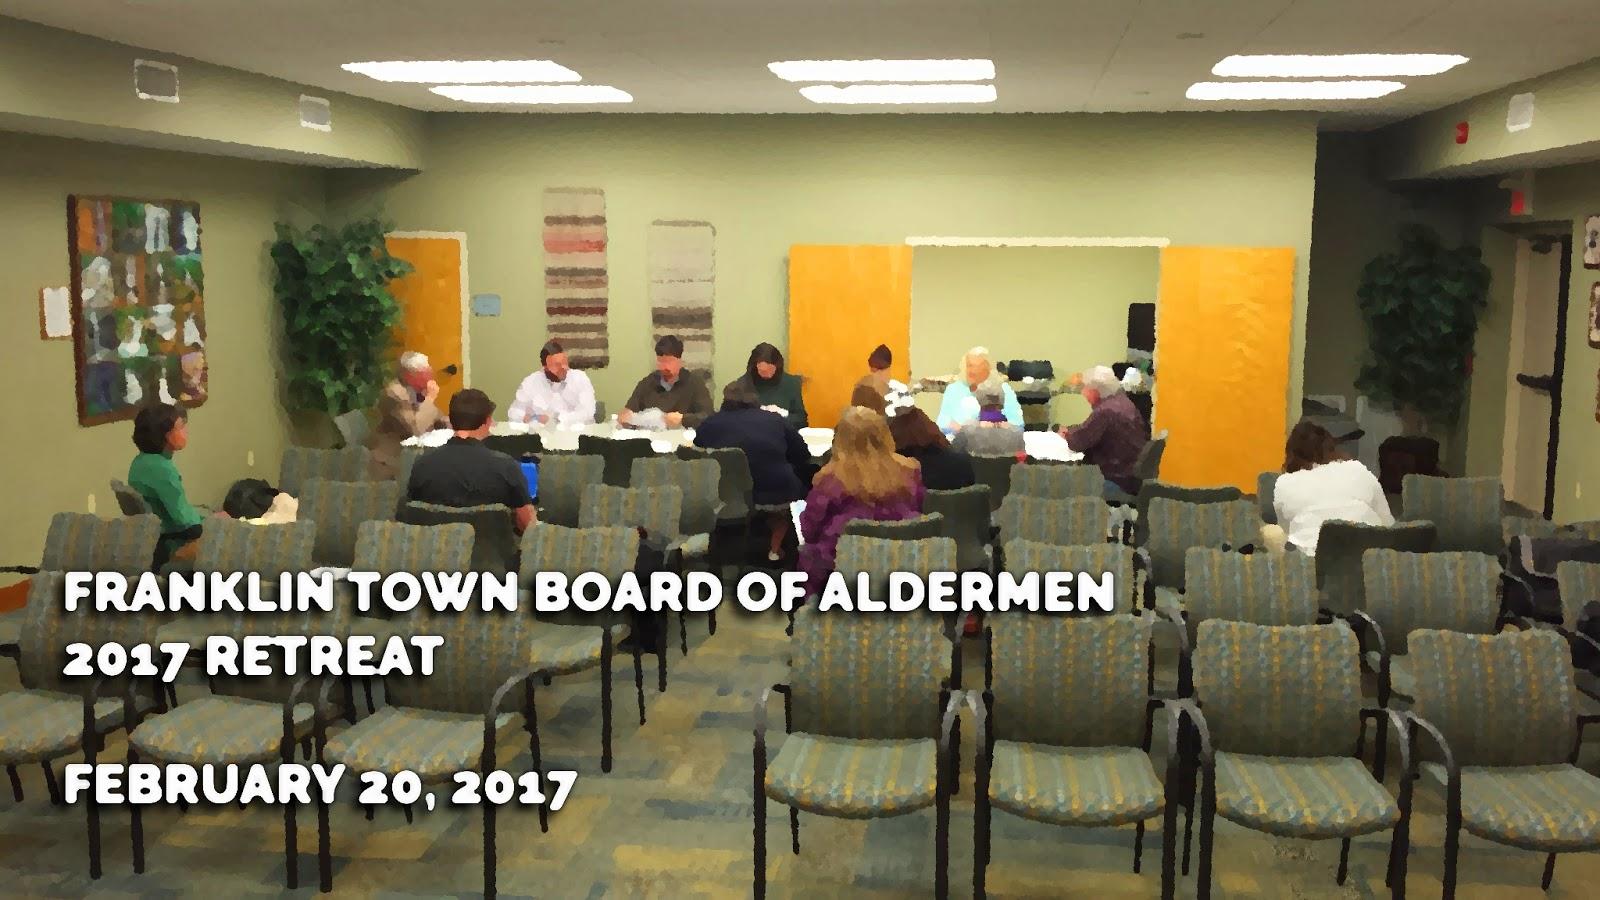 Franklin Town Board  2017 Retreat Title Card